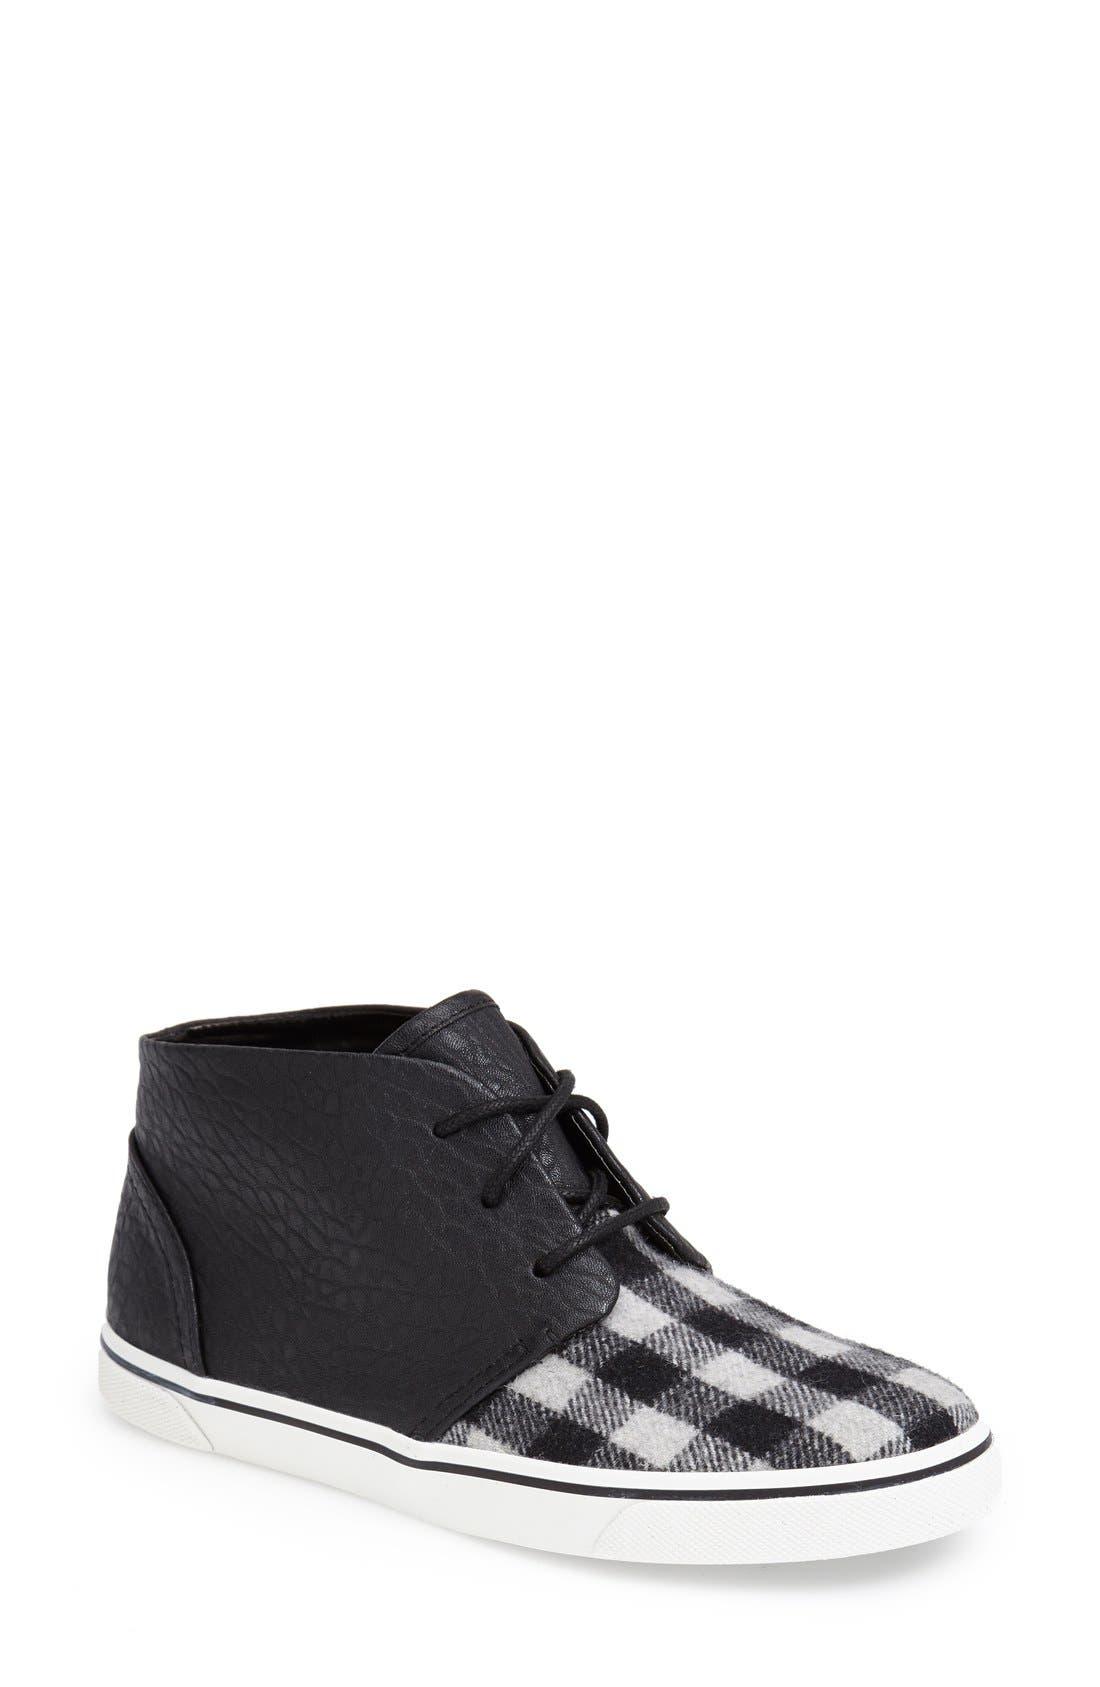 DV BY DOLCE VITA,                             'Giaa' Sneaker,                             Main thumbnail 1, color,                             020